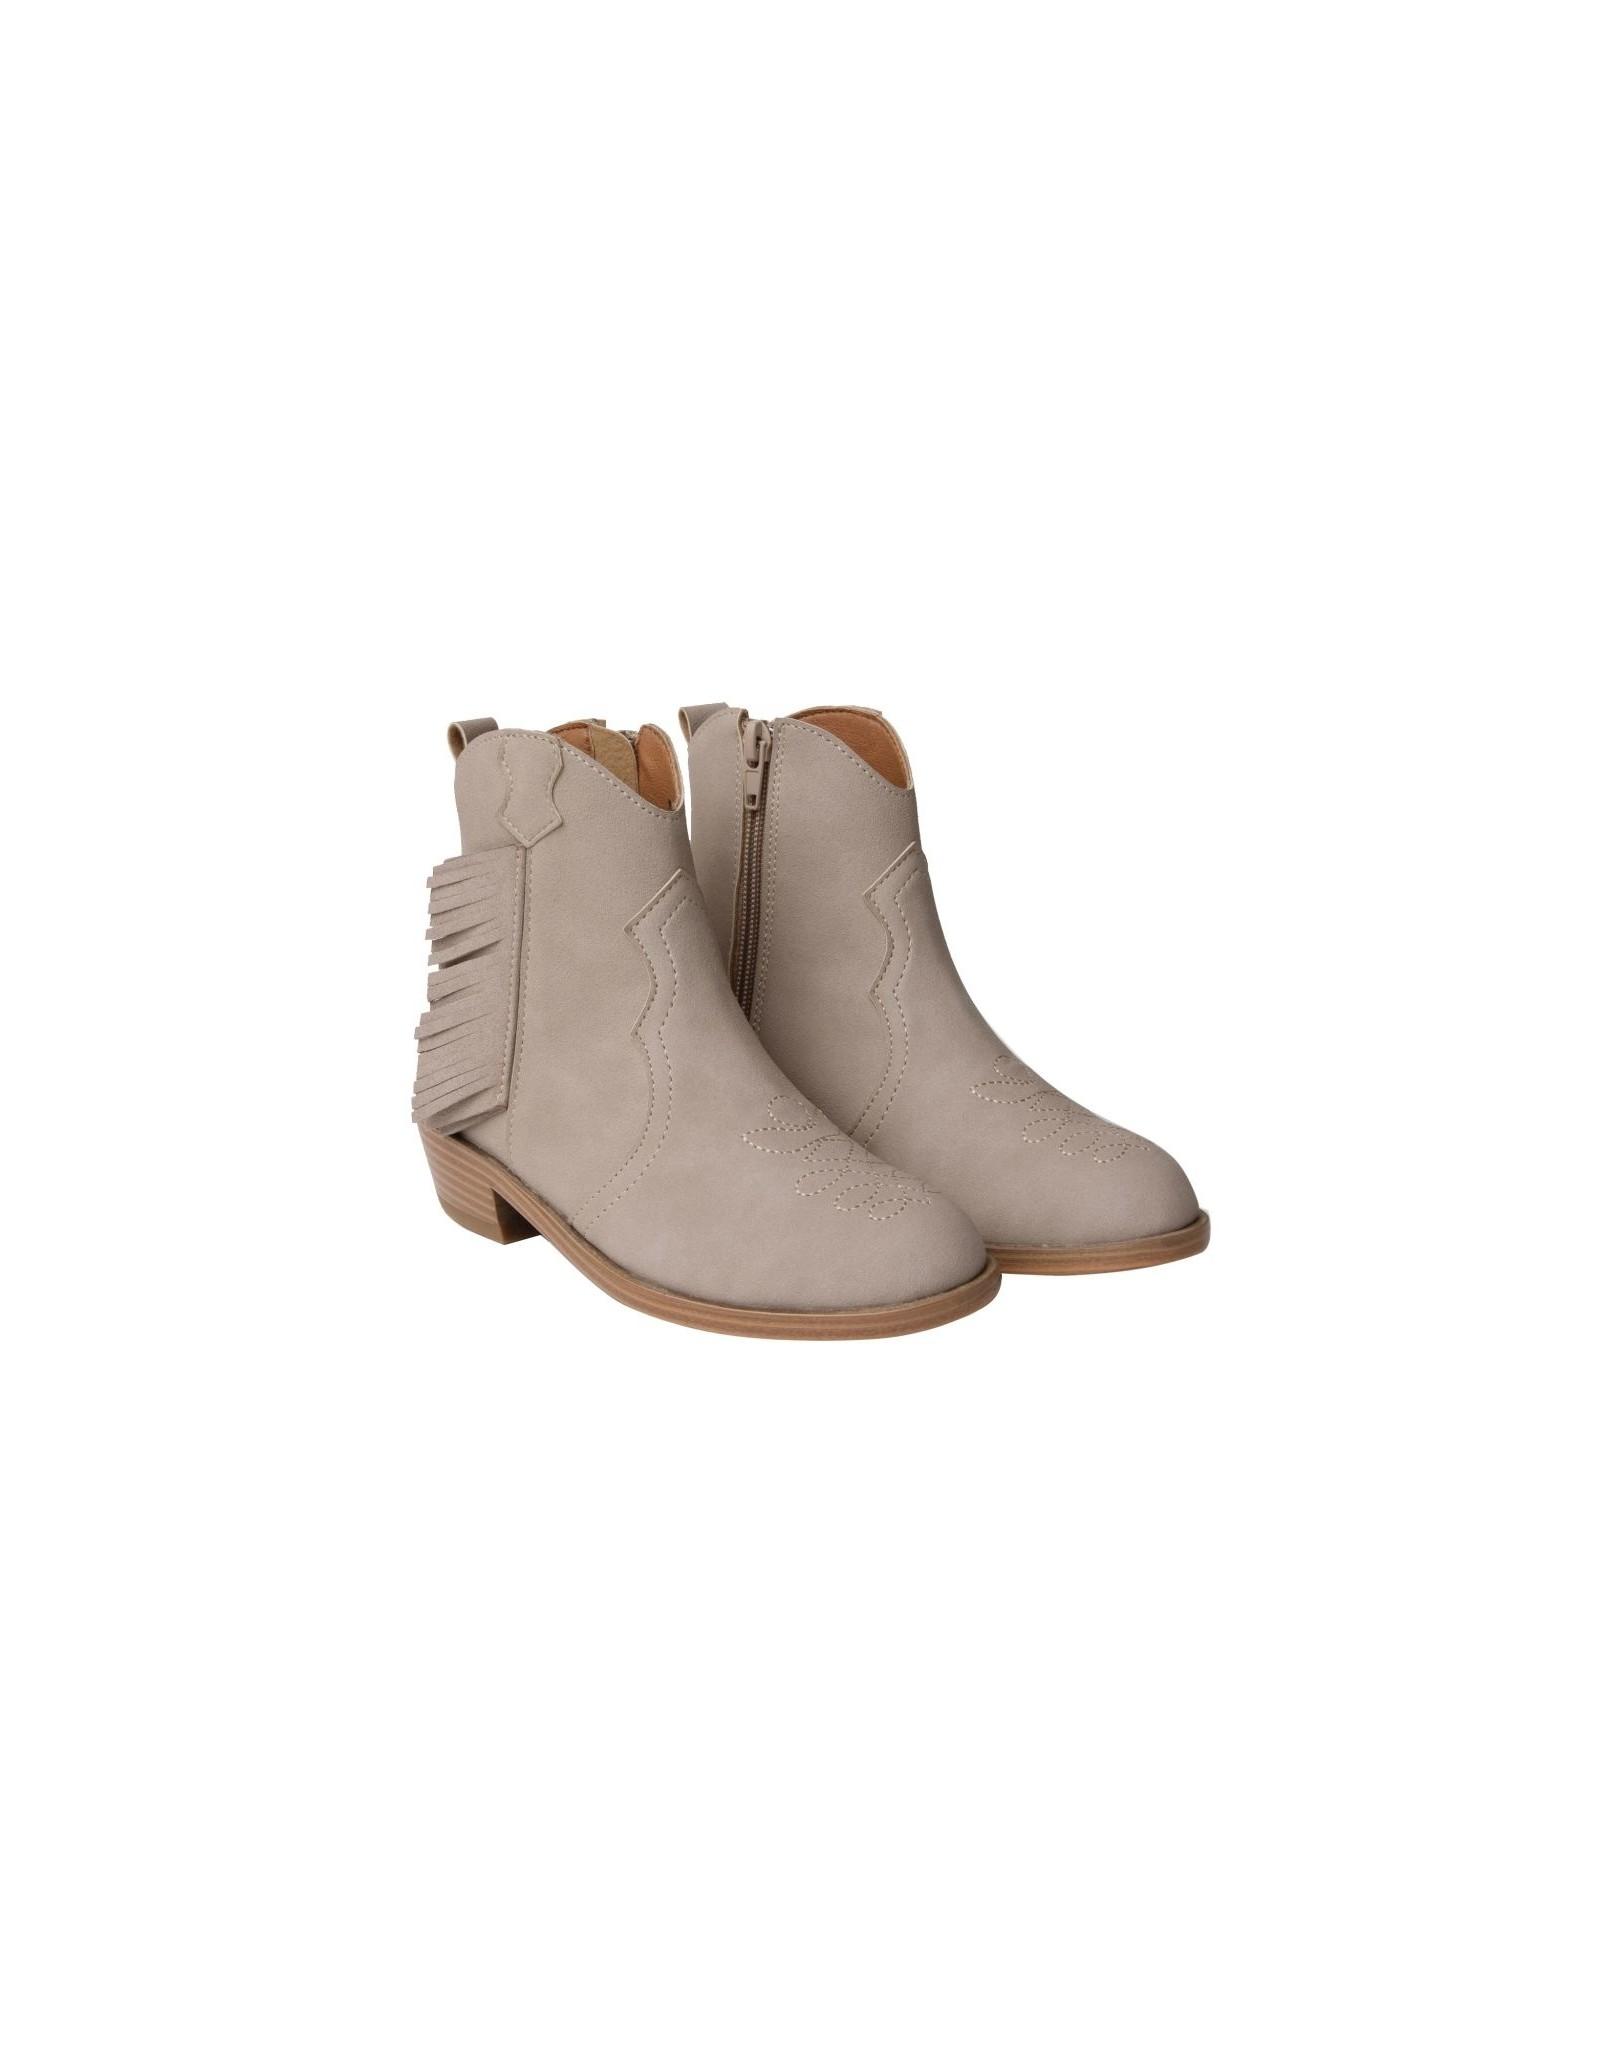 Rylee and Cru western boots- beige